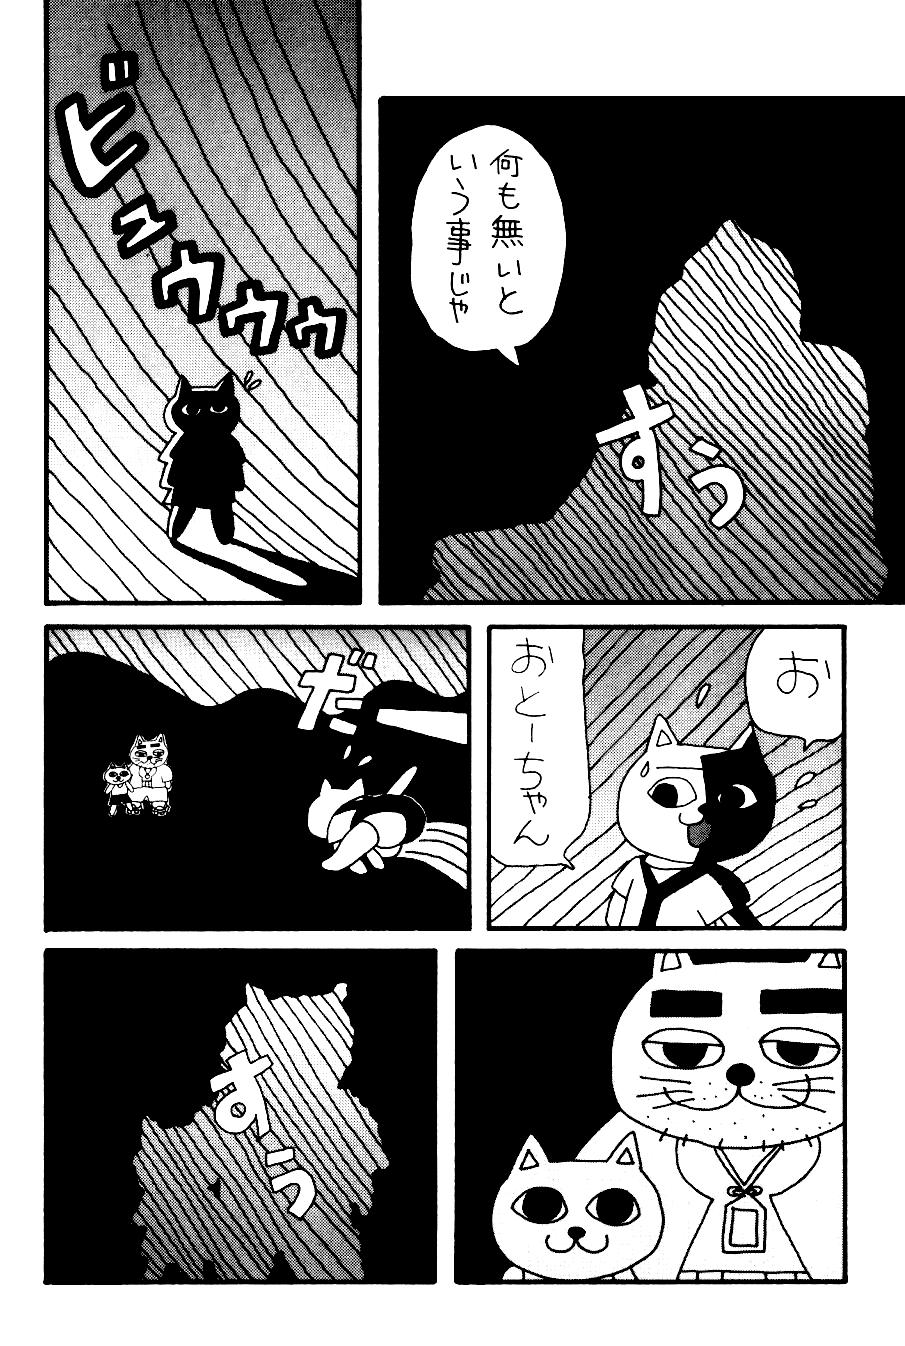 f:id:kougasetumei:20180919063547p:image